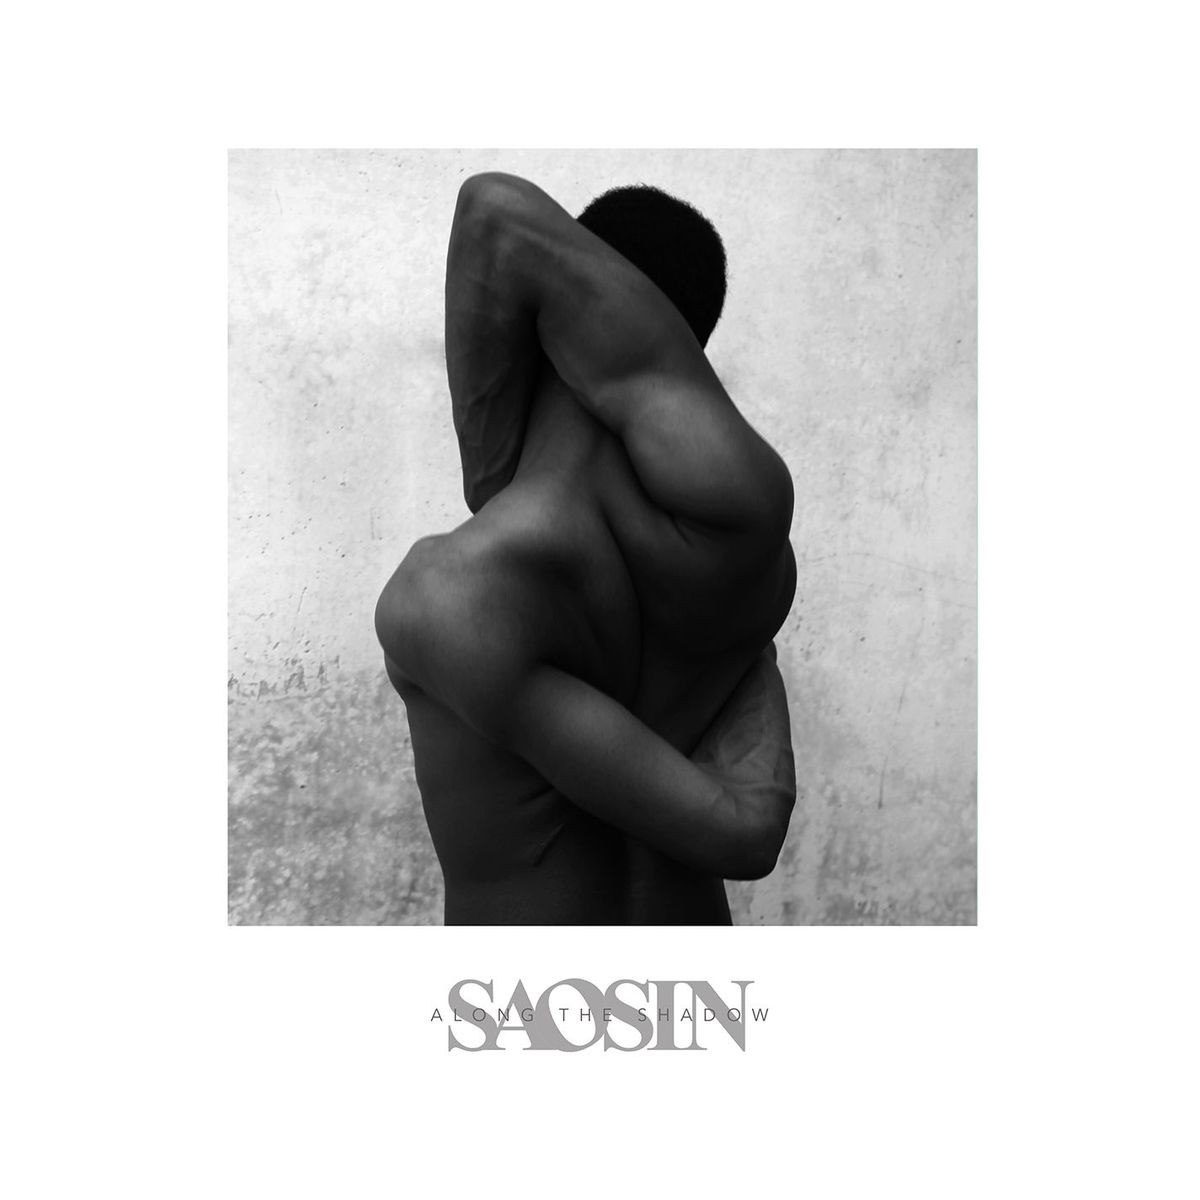 Saosin - Control and The Urge to Pray [single] (2016)